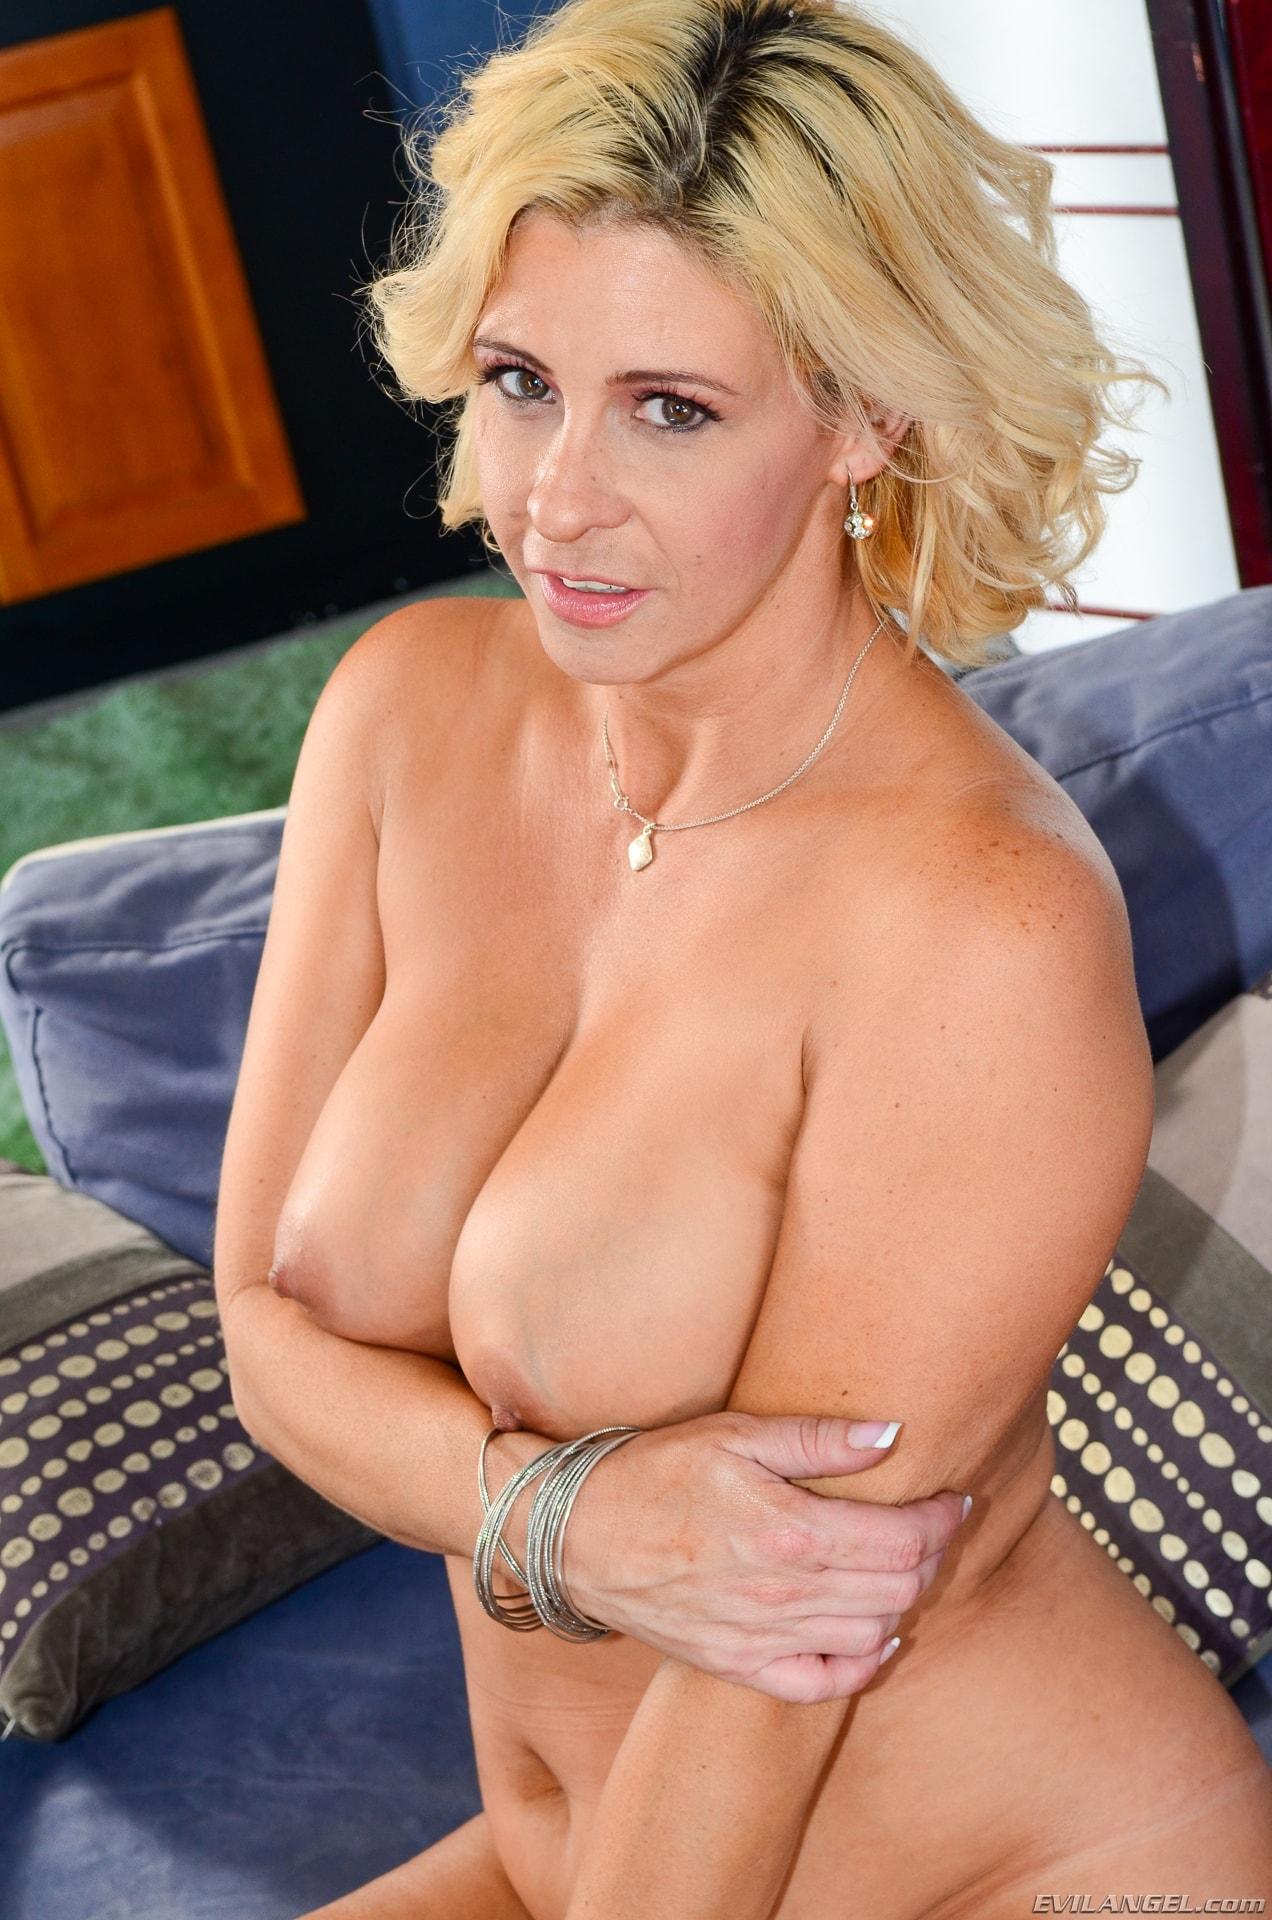 Beautiful blonde milf jane doux in black stockings posing on bed